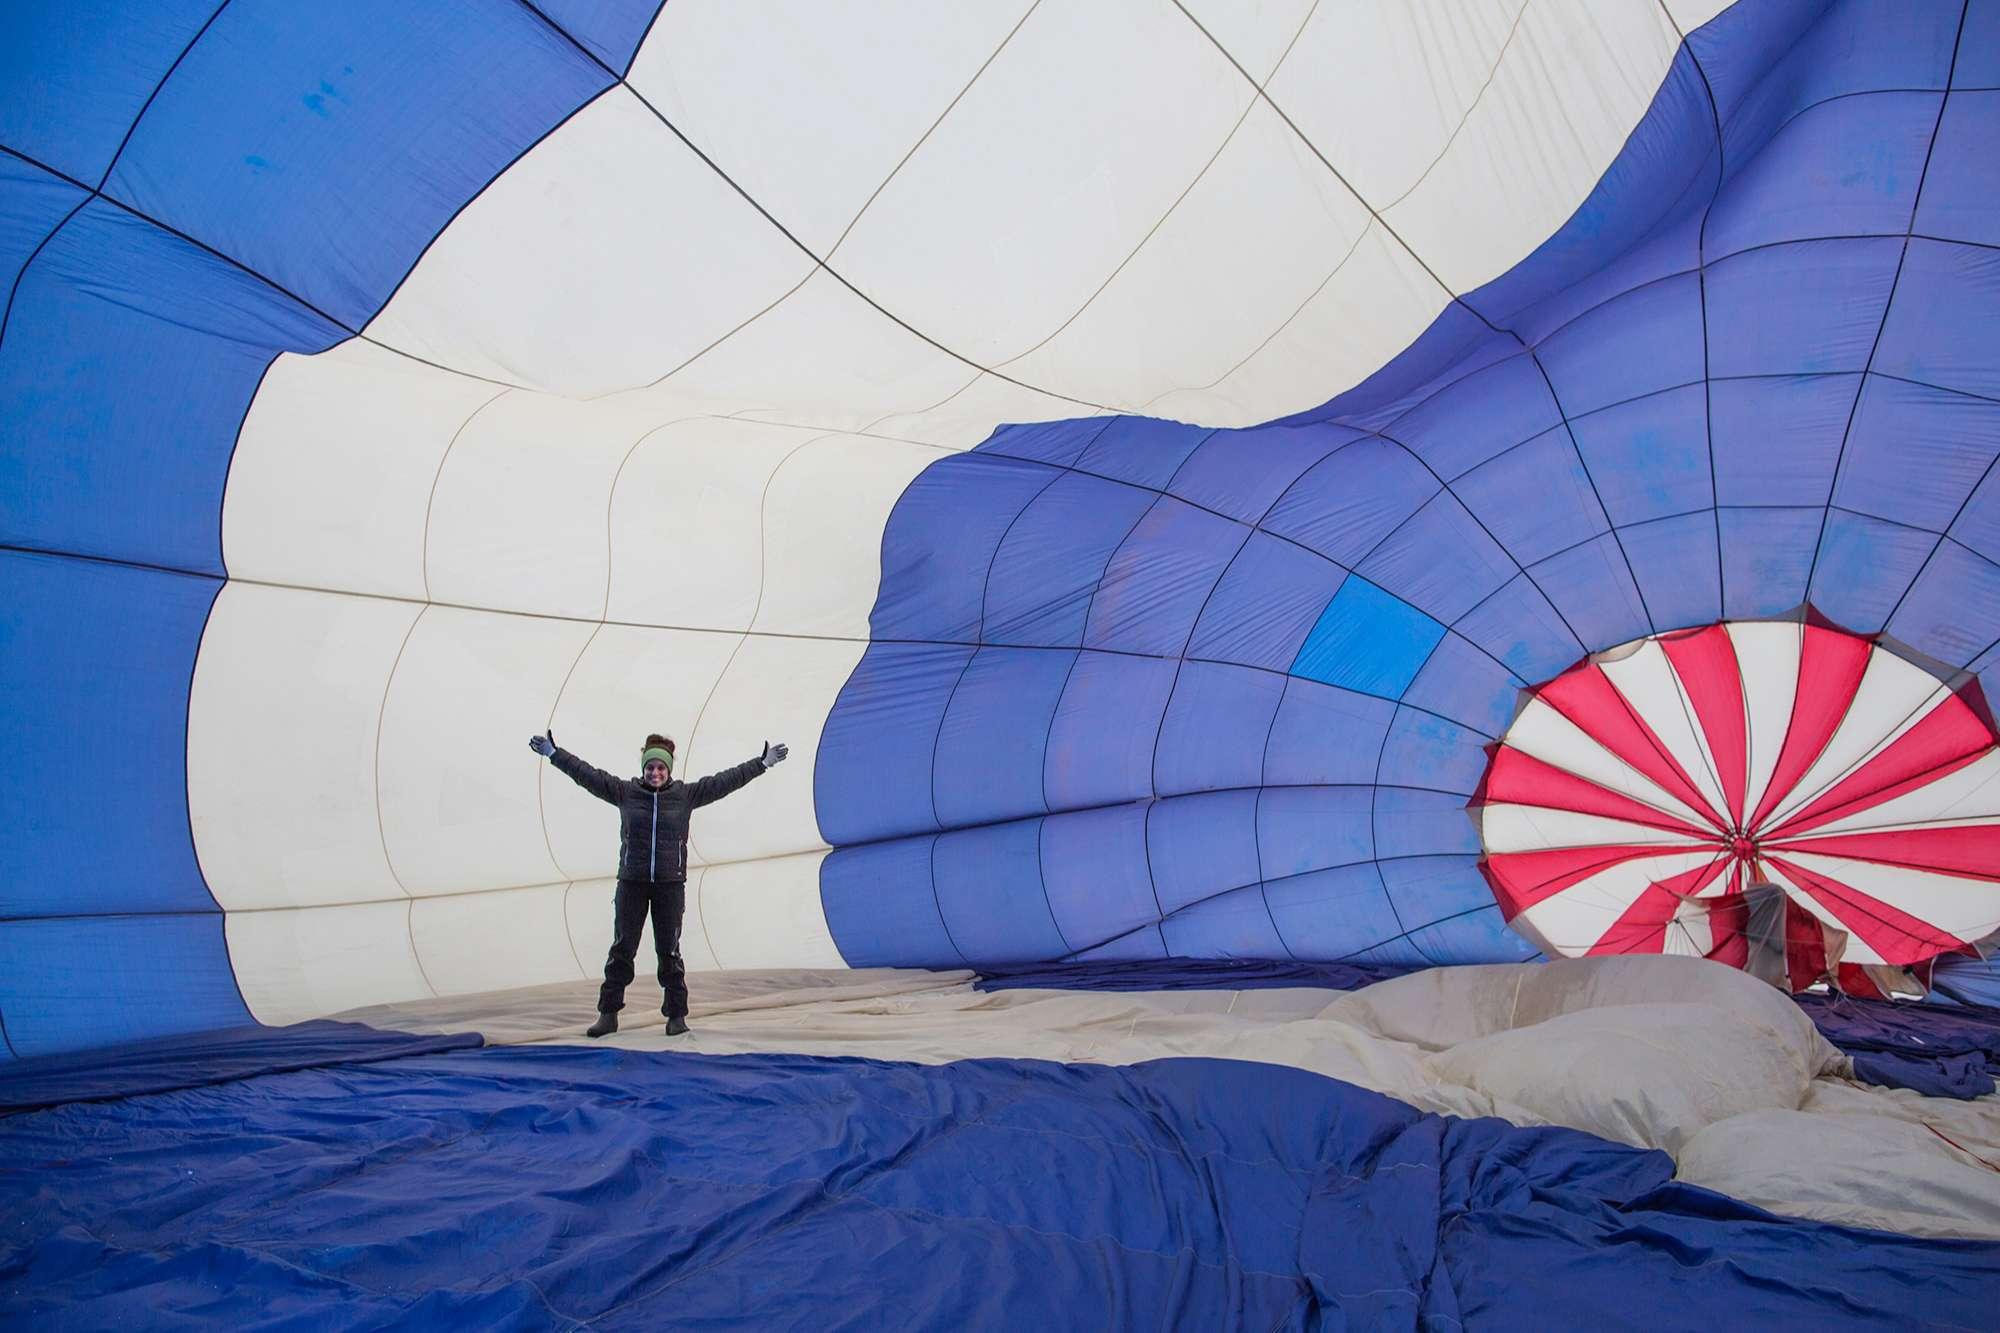 sweden hot air ballooning participant asc